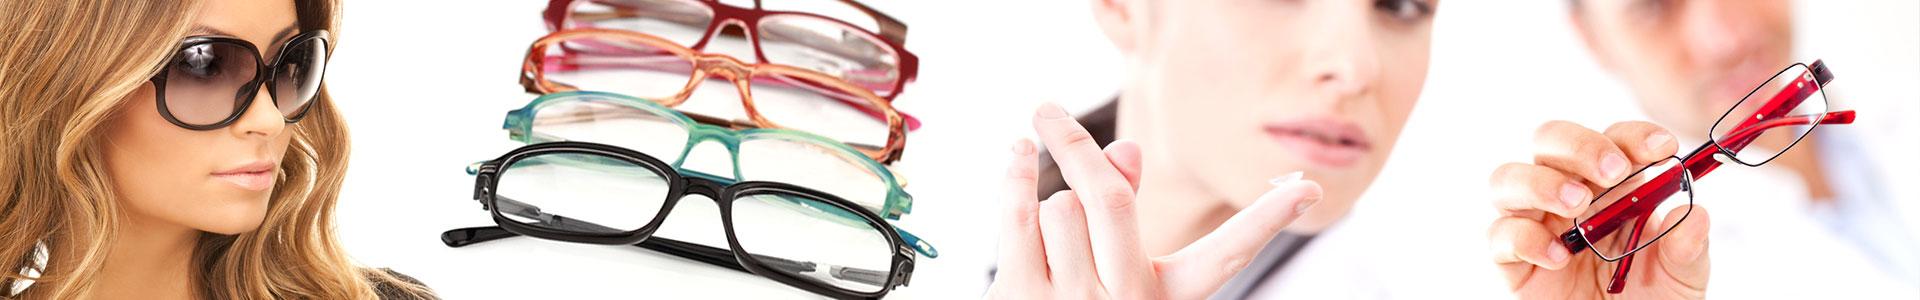 optical-store-white-eye-care-logan-wv-family-eye-care-eye-exams-designer-frames-sunglasses-contacts-banner